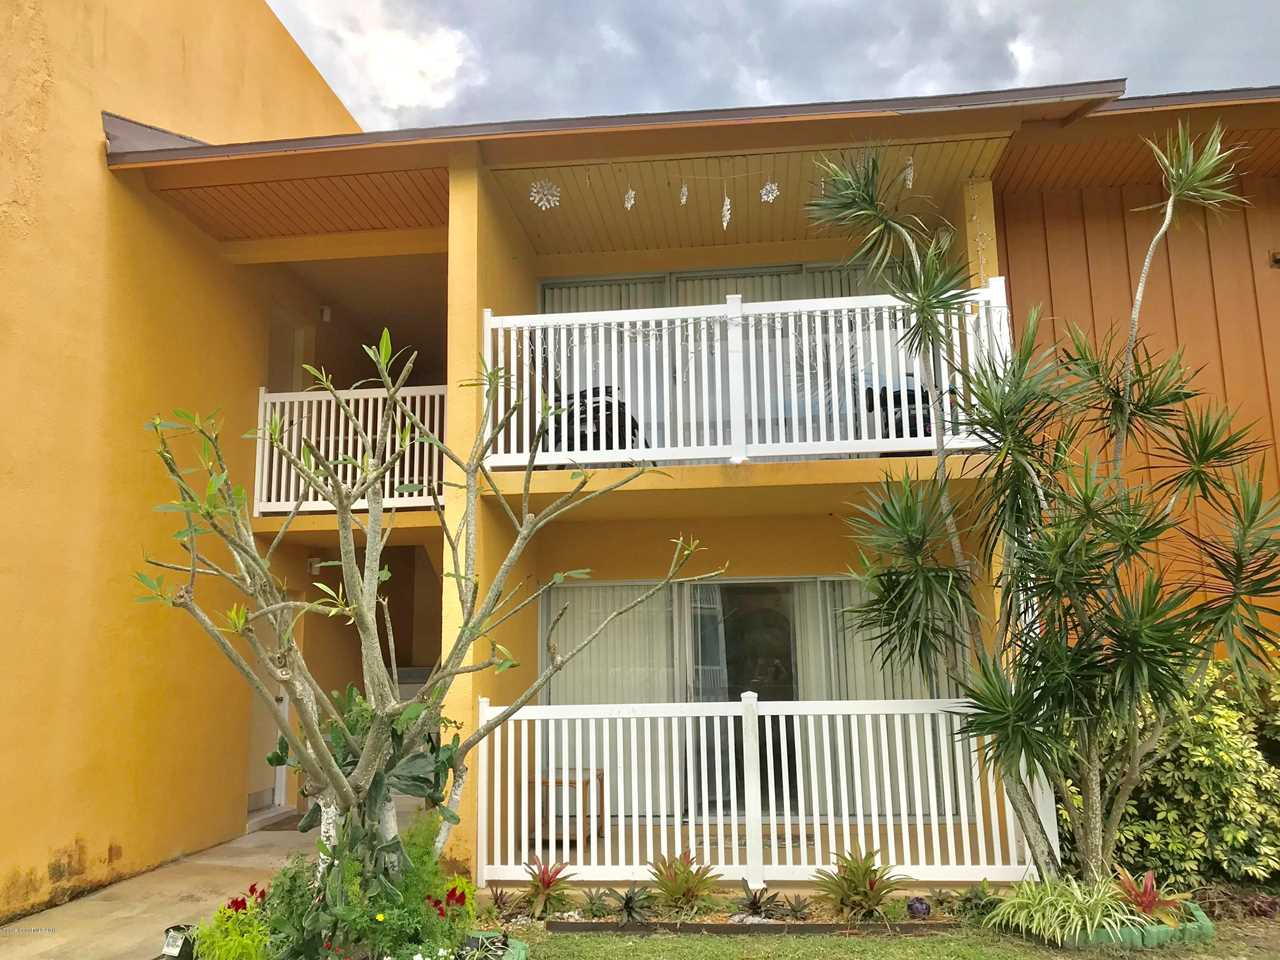 250 N Banana River Drive #D11 Merritt Island, FL 32952 | MLS 842095 Photo 1